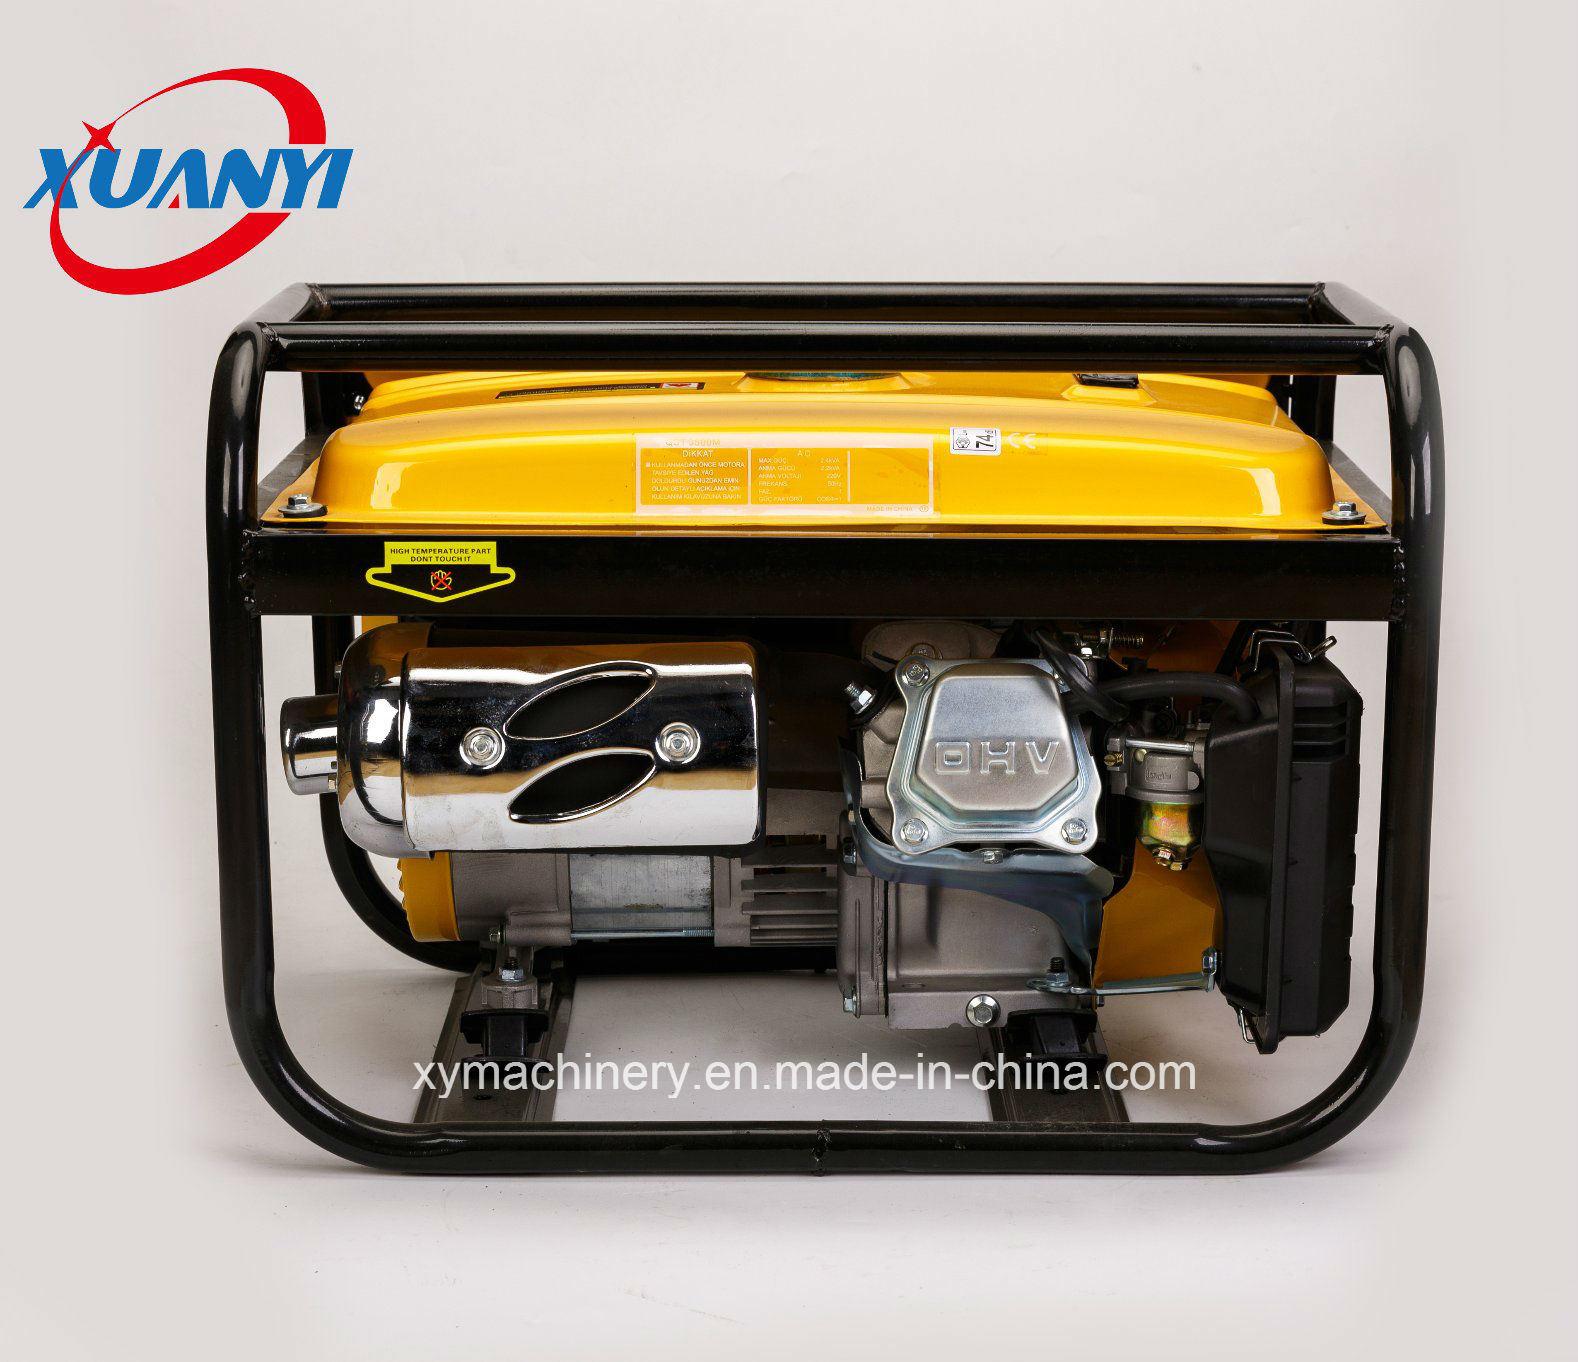 High Quality 2500W 7HP 100% Copper Wire Electric Start Petrol/Gasoline Generator